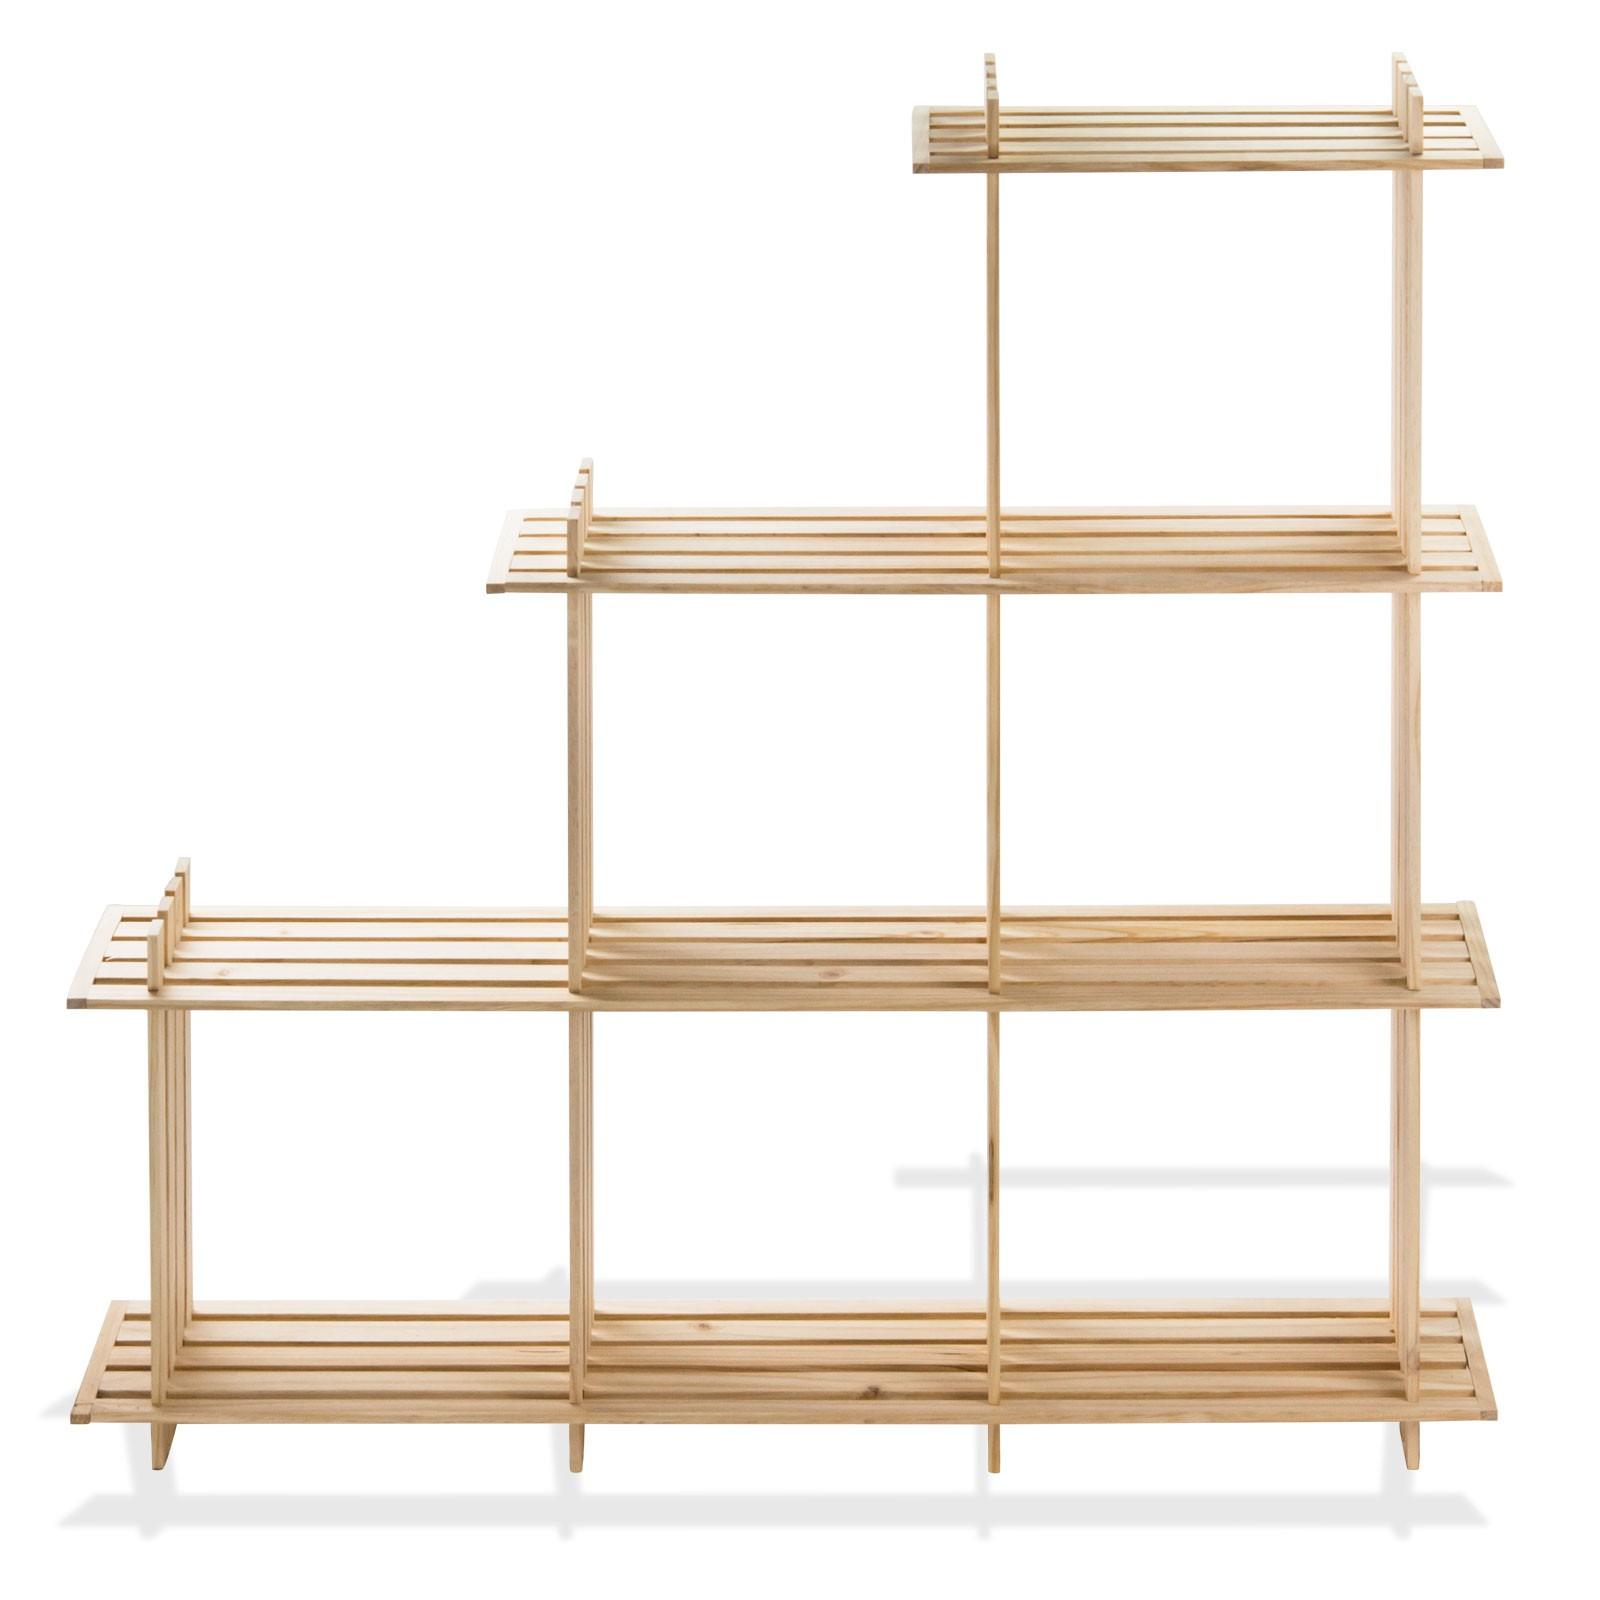 holzregal 6 f cher wohnregal b cher regal w rfel regal. Black Bedroom Furniture Sets. Home Design Ideas